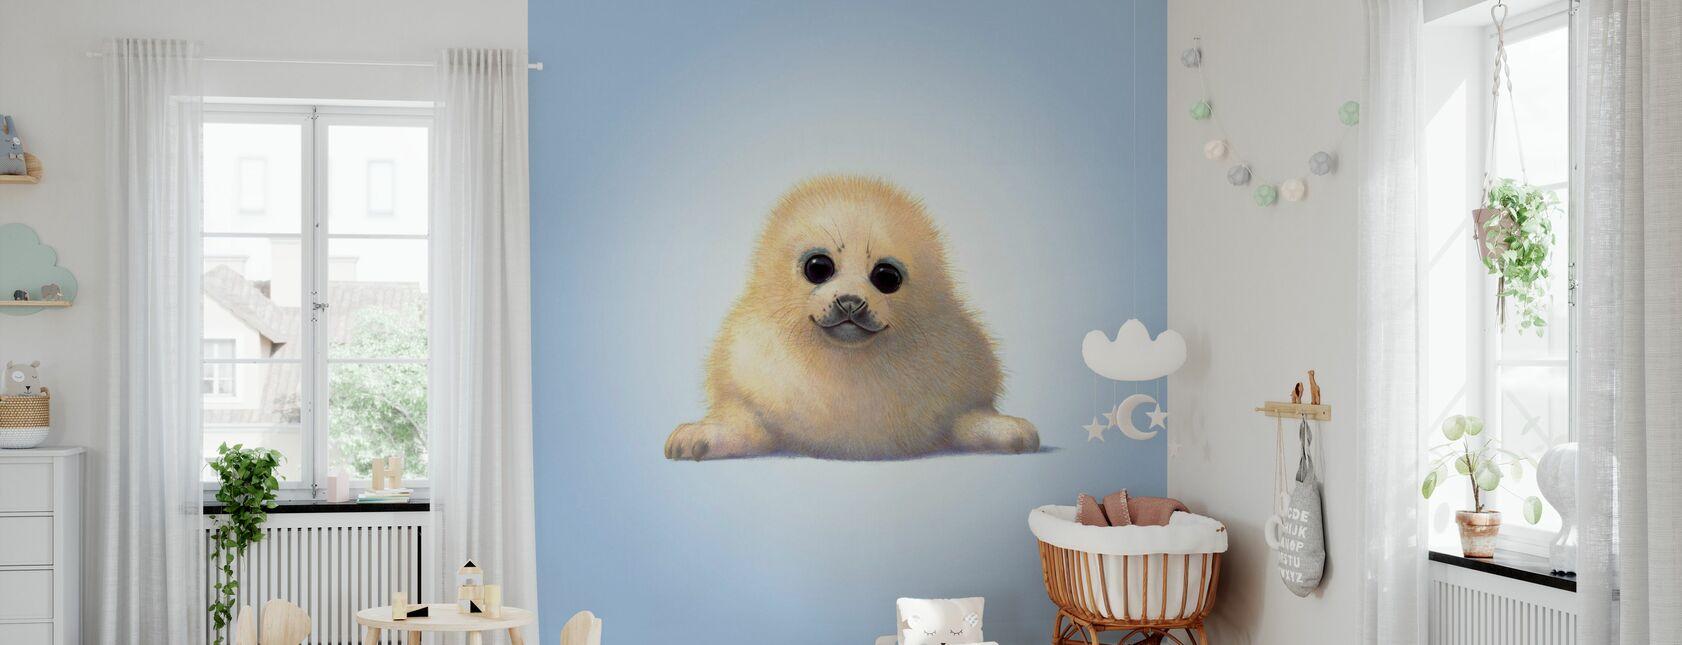 Seal Pup - Wallpaper - Nursery